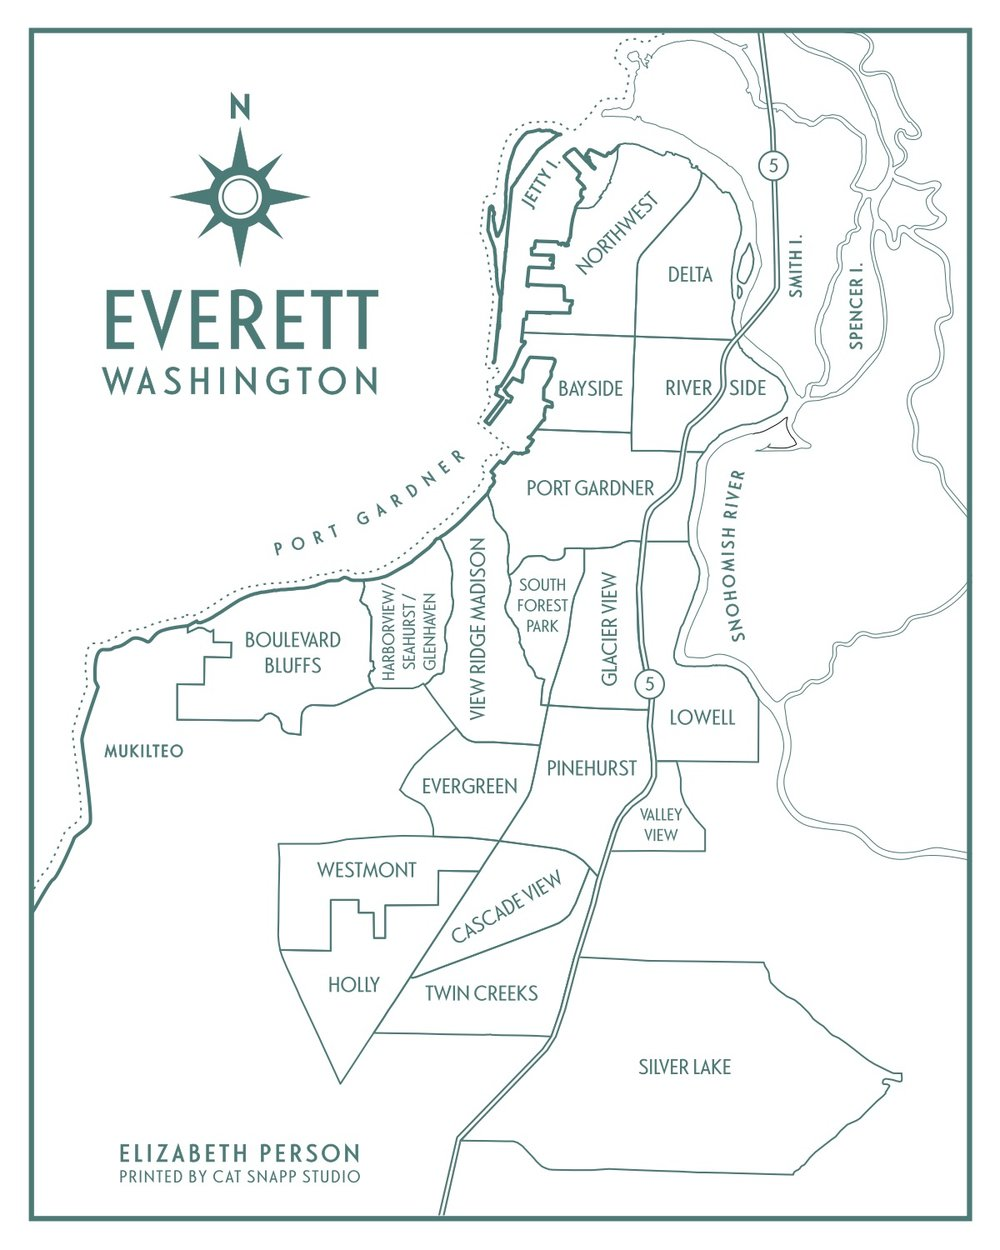 Everett Neighborhood Map by  Elizabeth Person Art & Design .